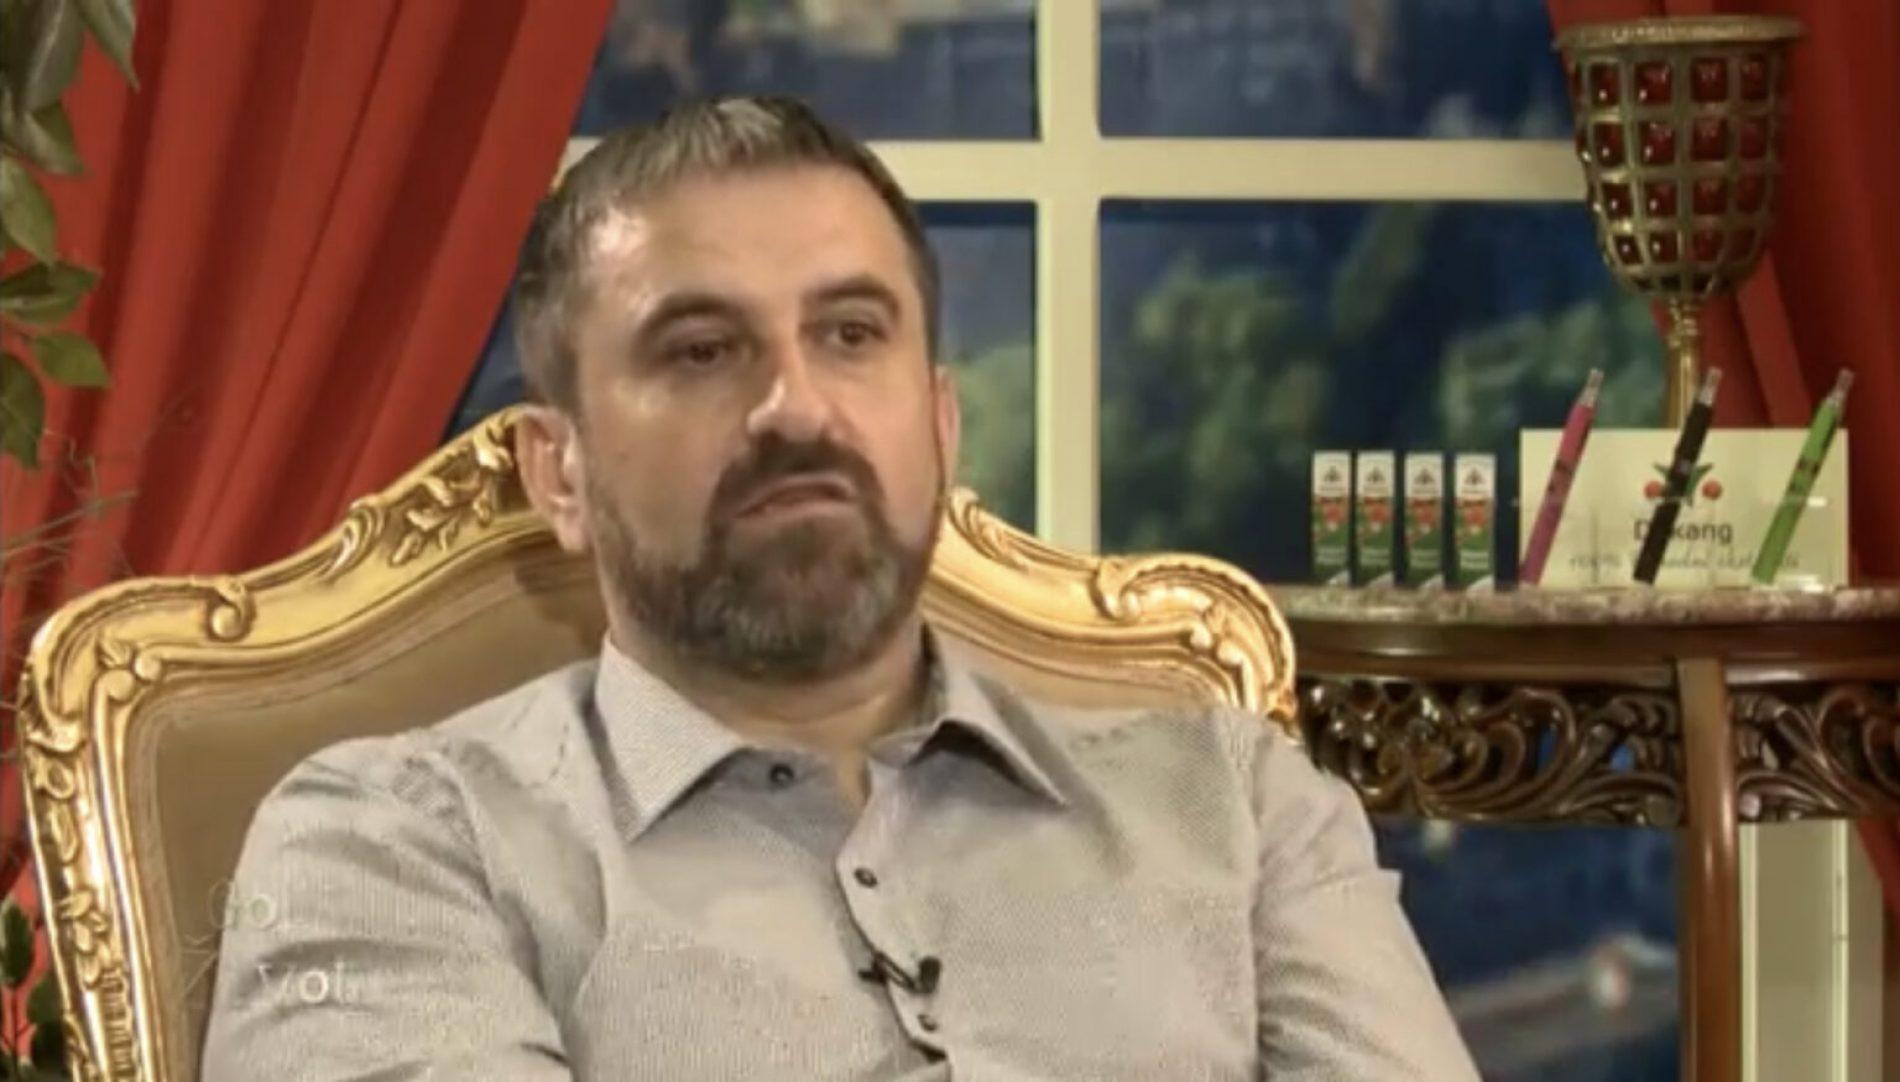 Srbija – utočište za odbjegle ratne zločince! Lica s potjernica Interpola nerijetko gostuju i na televiziji